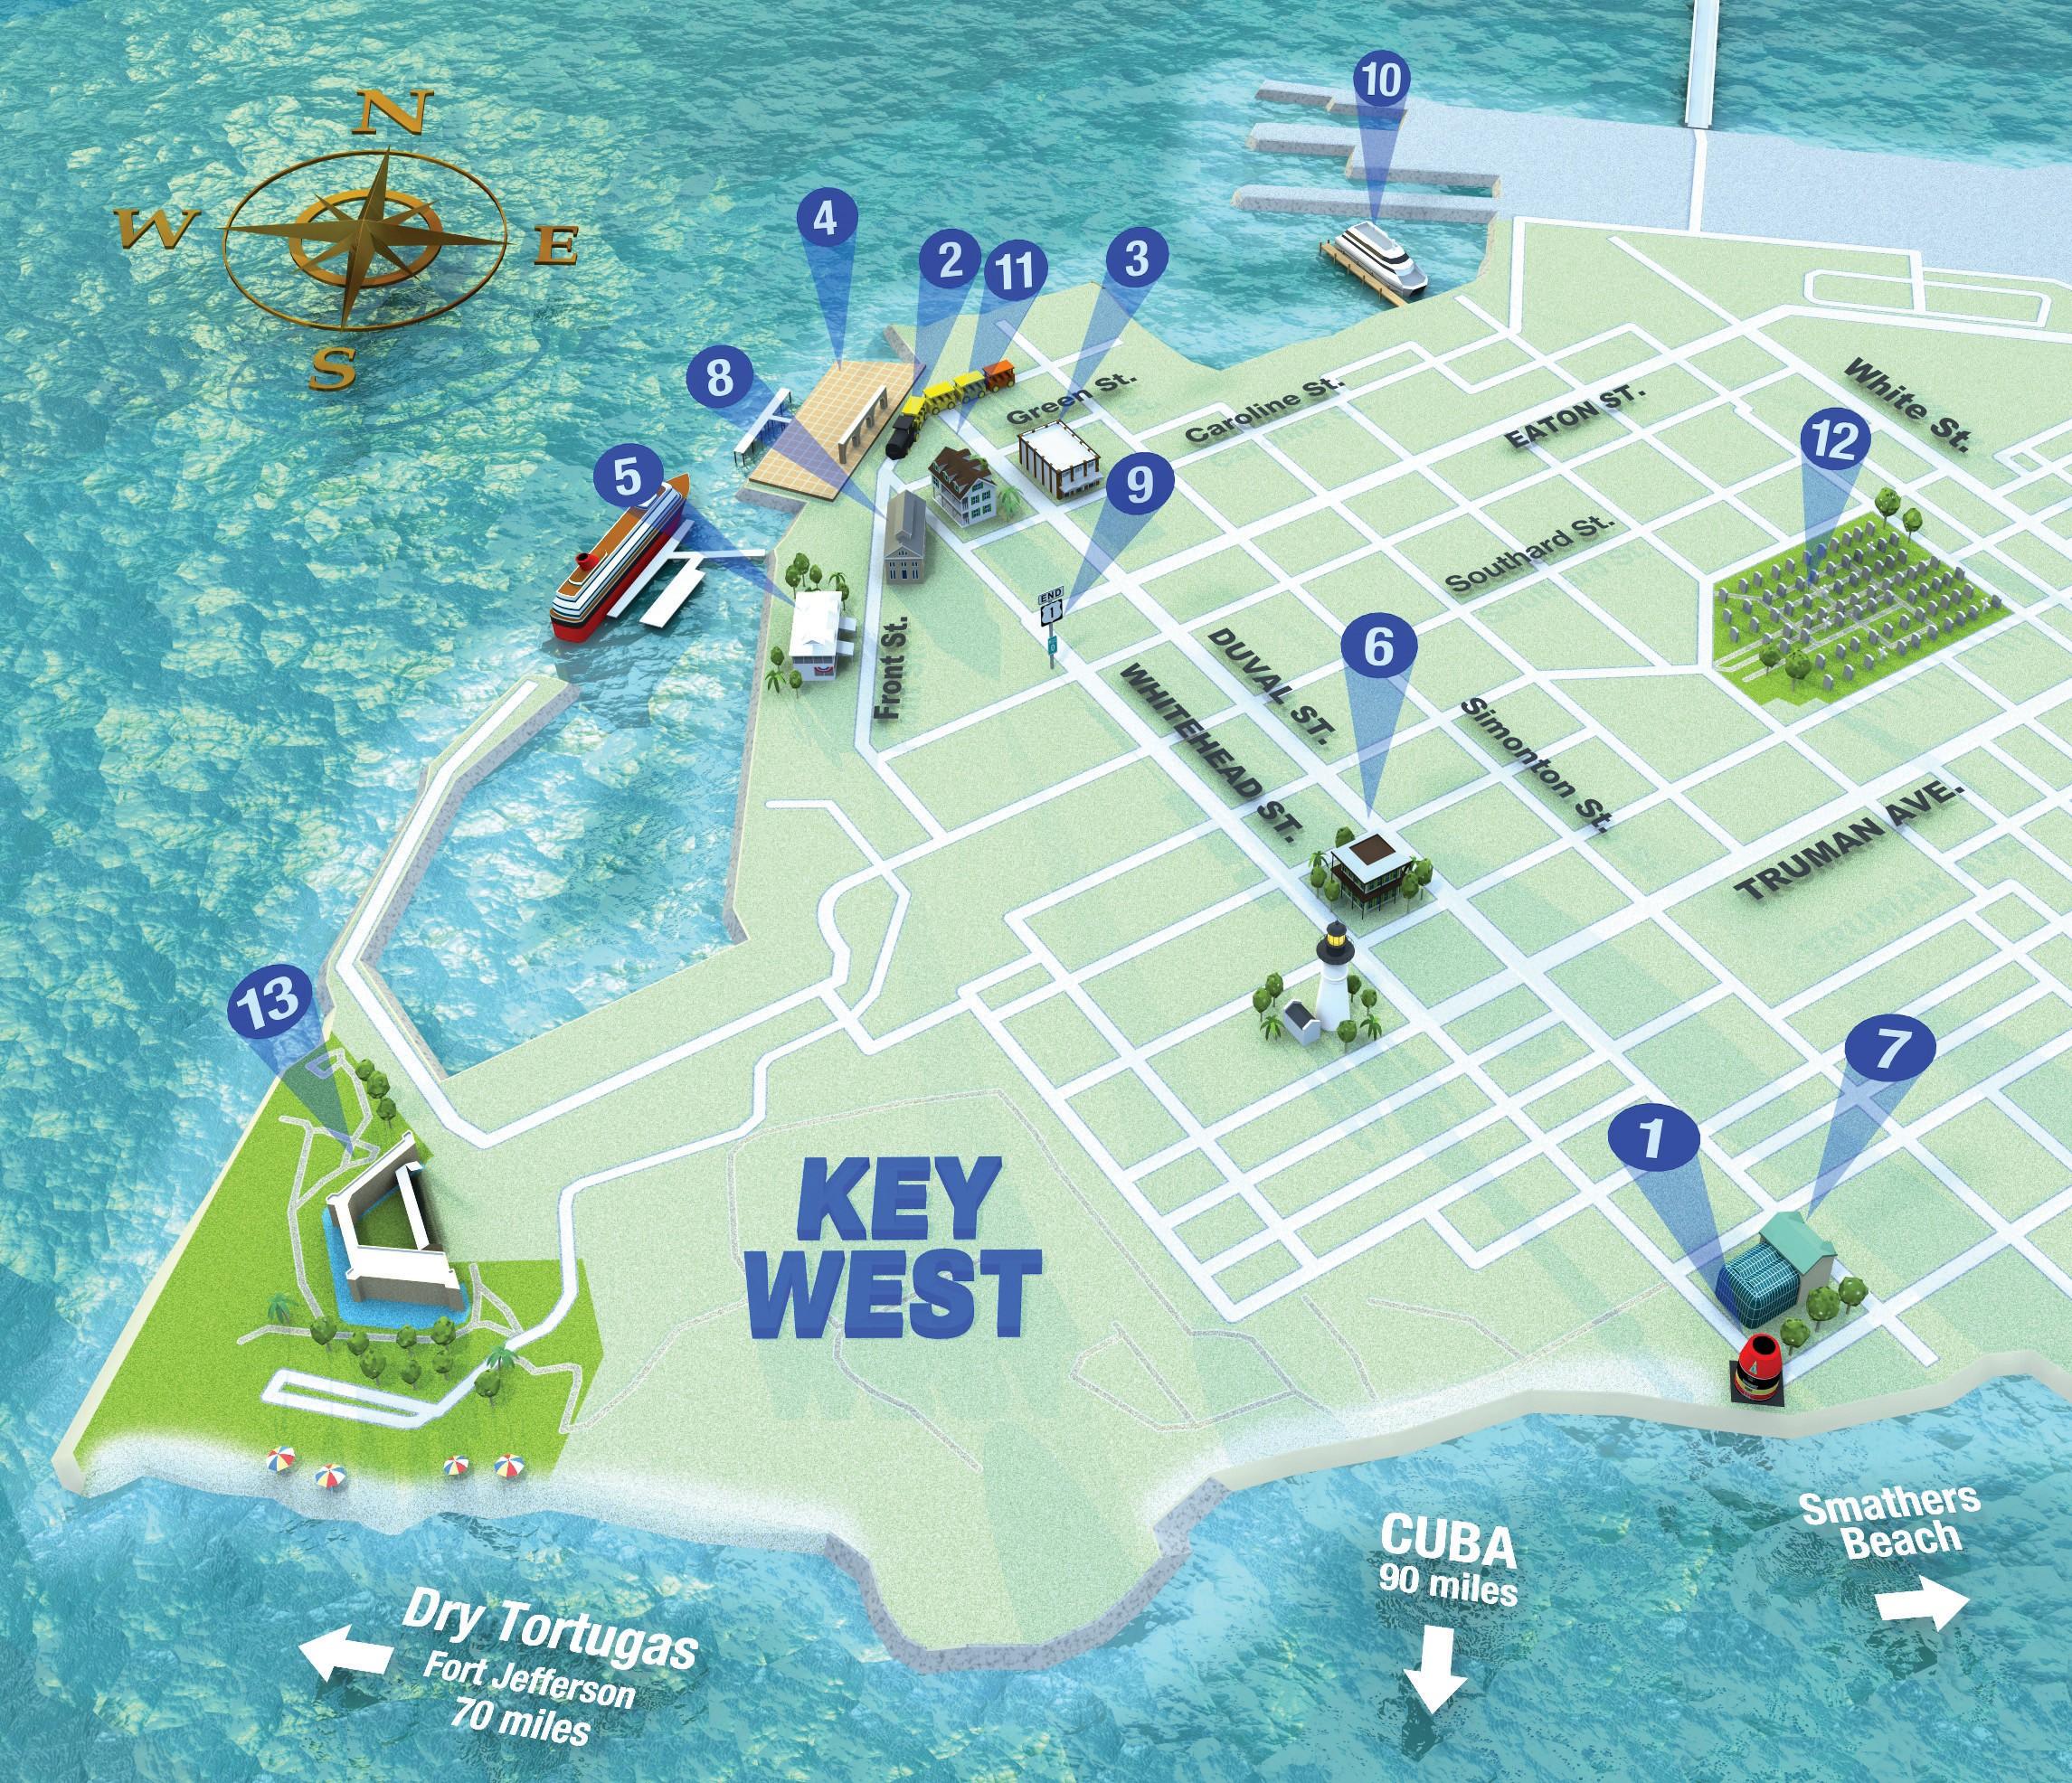 Key West Florida Map.Map It Out Key West Florida Weekly Key West News